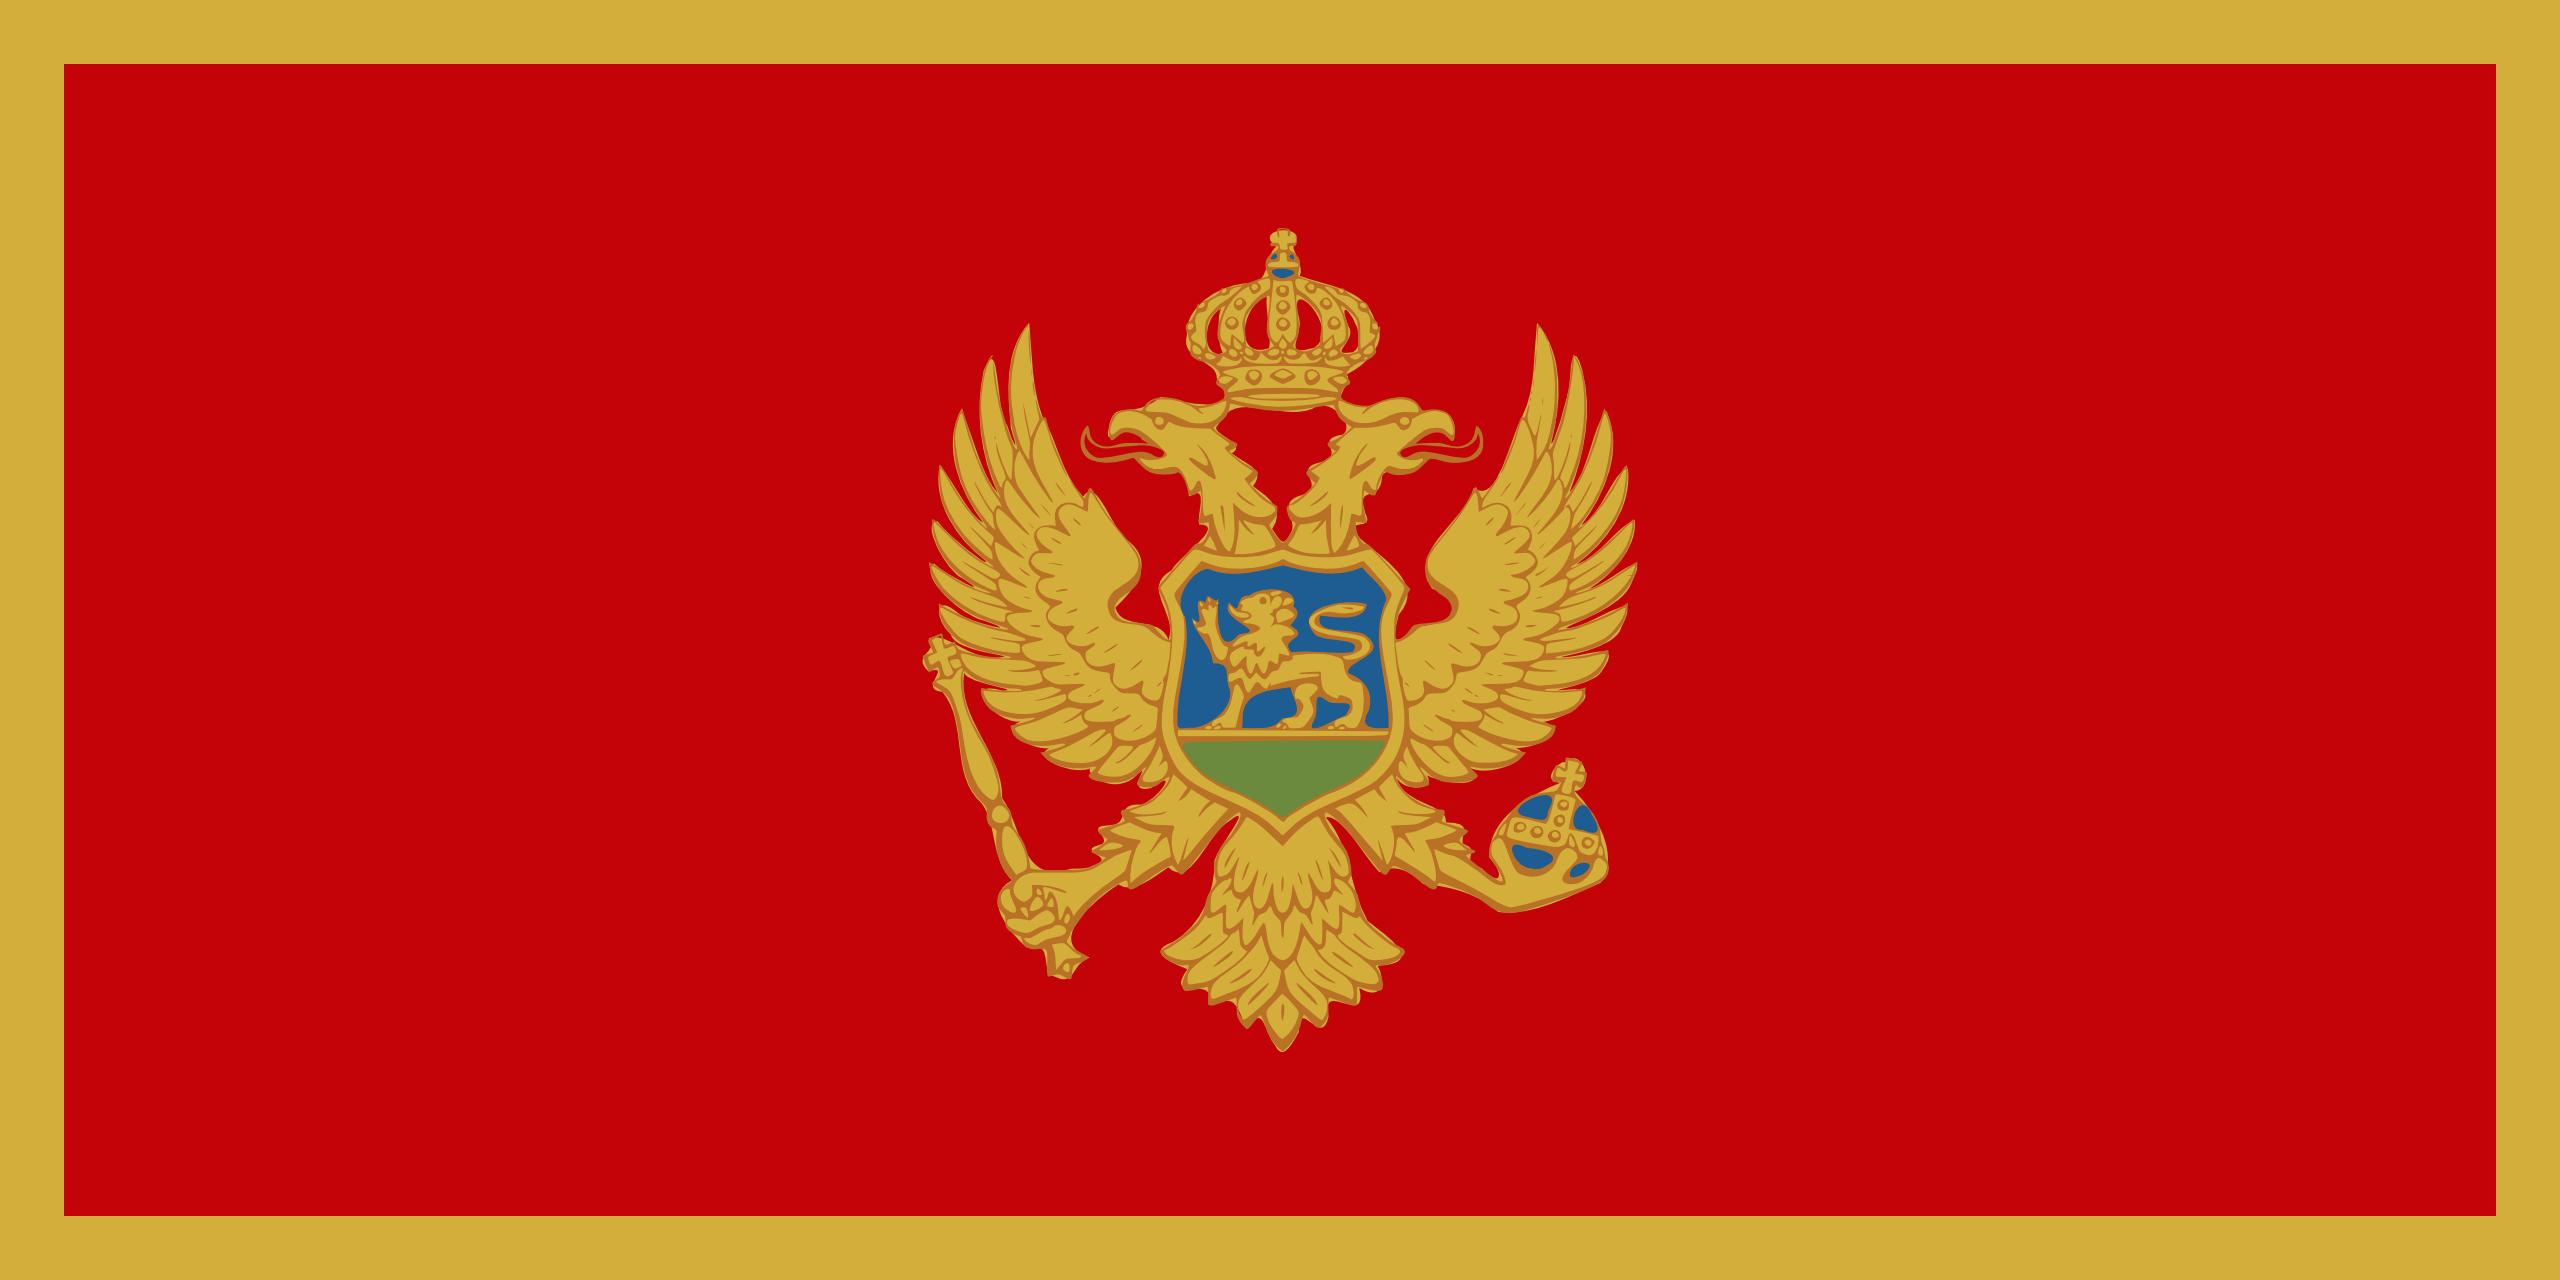 montenegro, страна, Эмблема, логотип, символ - Обои HD - Профессор falken.com